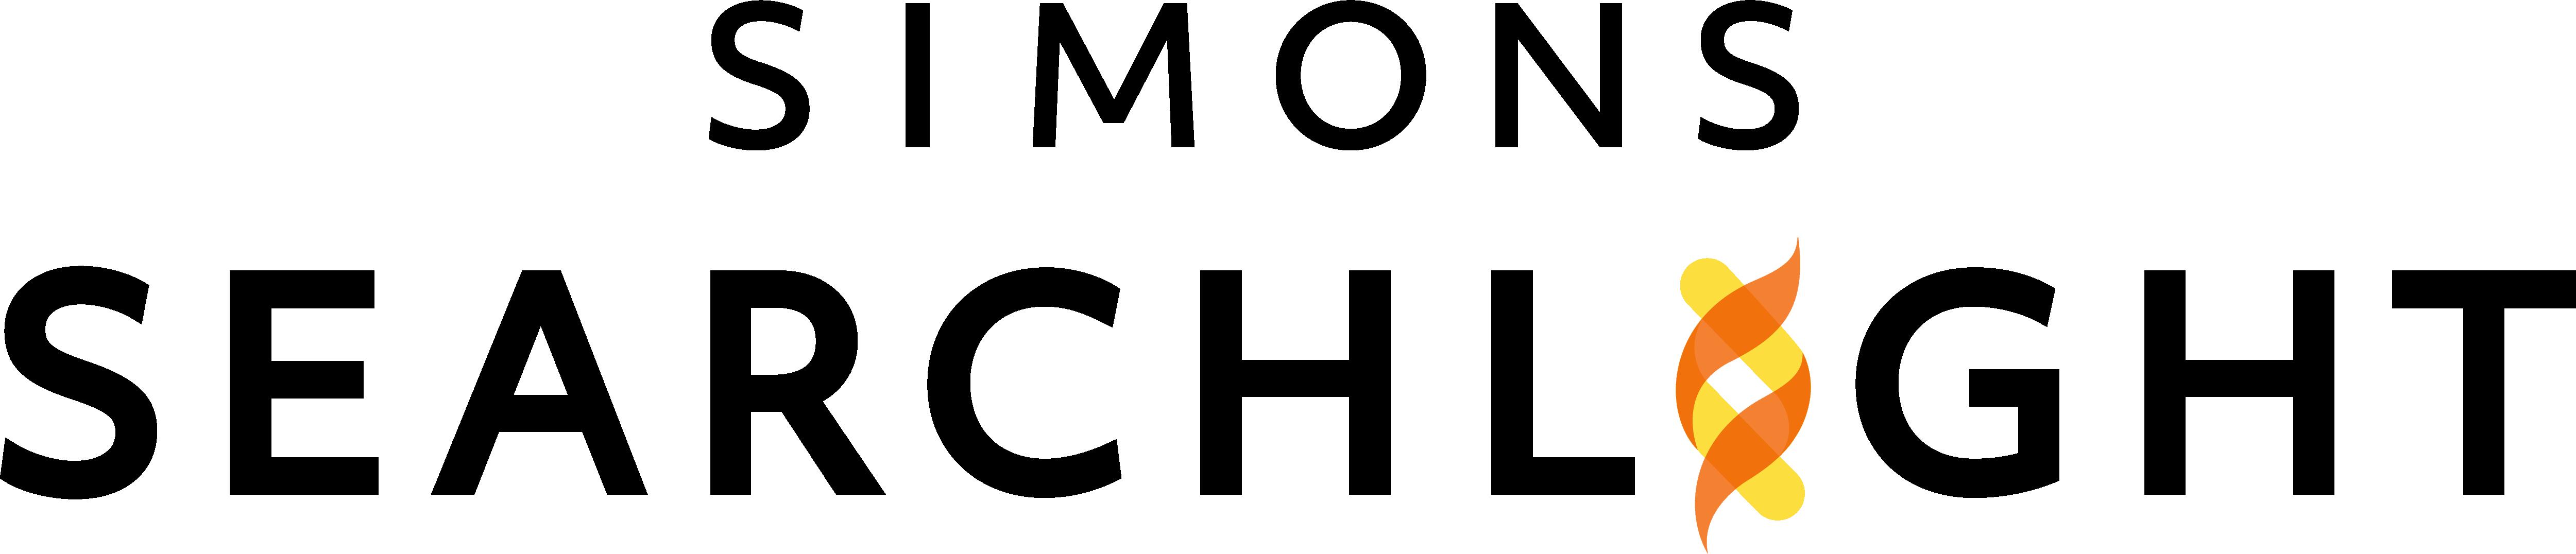 Searchlight_Logo_wSIMONS_RGB